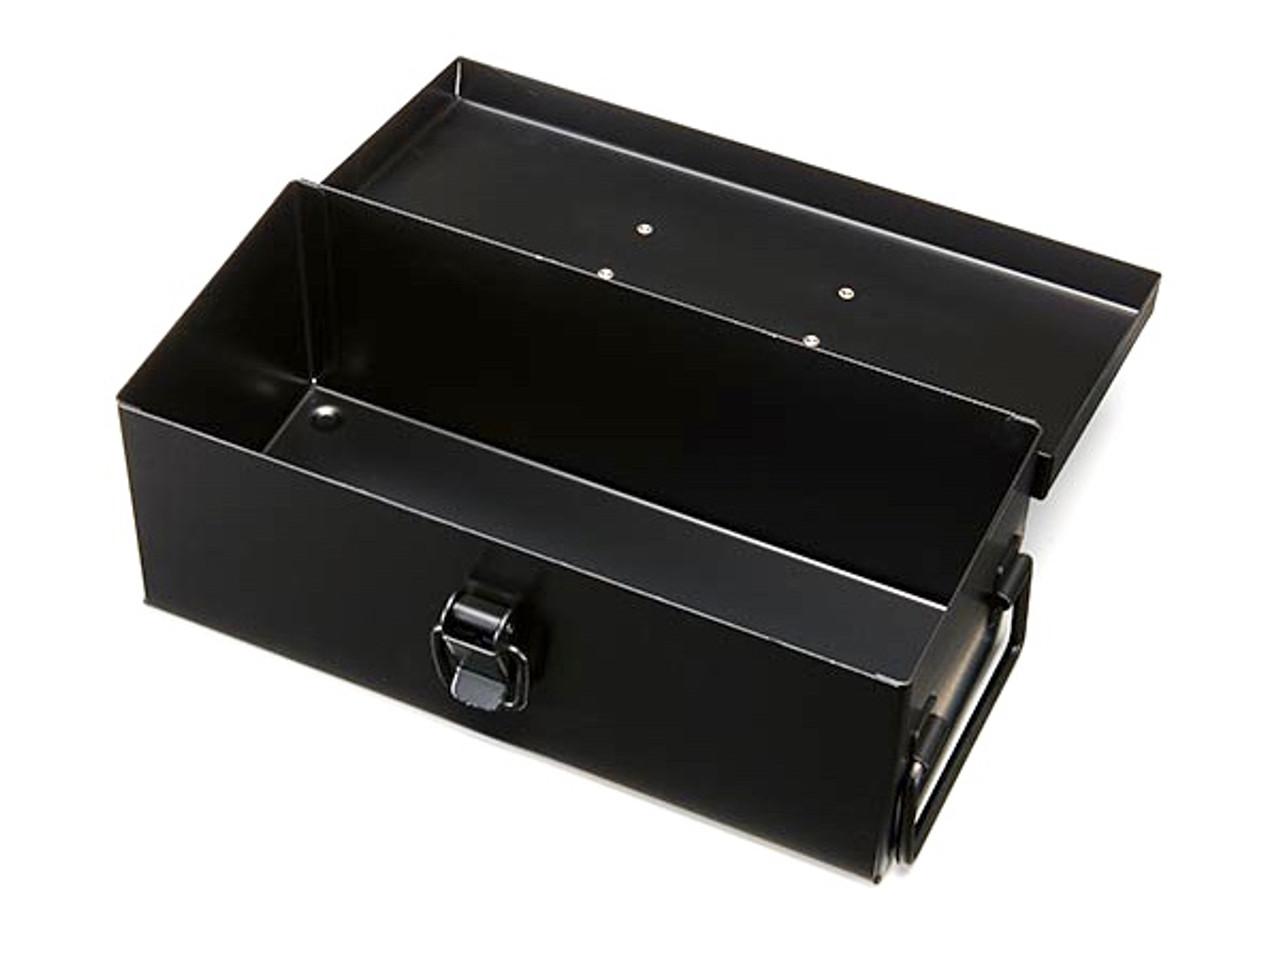 STI Steel Storage Box Medium STSG18100230 Open at AVOJDM.com